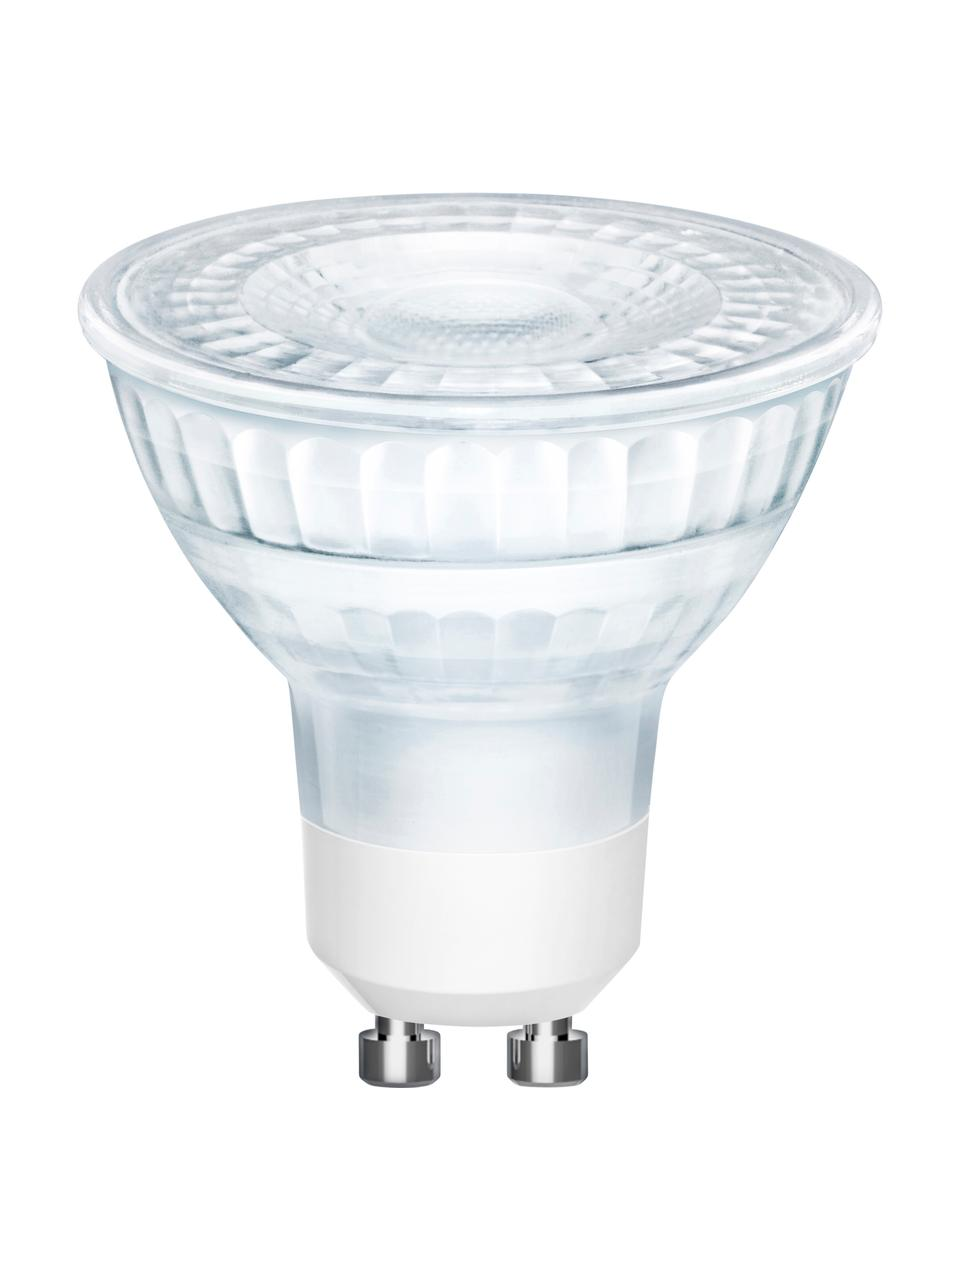 GU10 Leuchtmittel, 5W, dimmbar, warmweiß, 3 Stück, Leuchtmittelschirm: Glas, Leuchtmittelfassung: Aluminium, Transparent, Ø 5 x H 6 cm